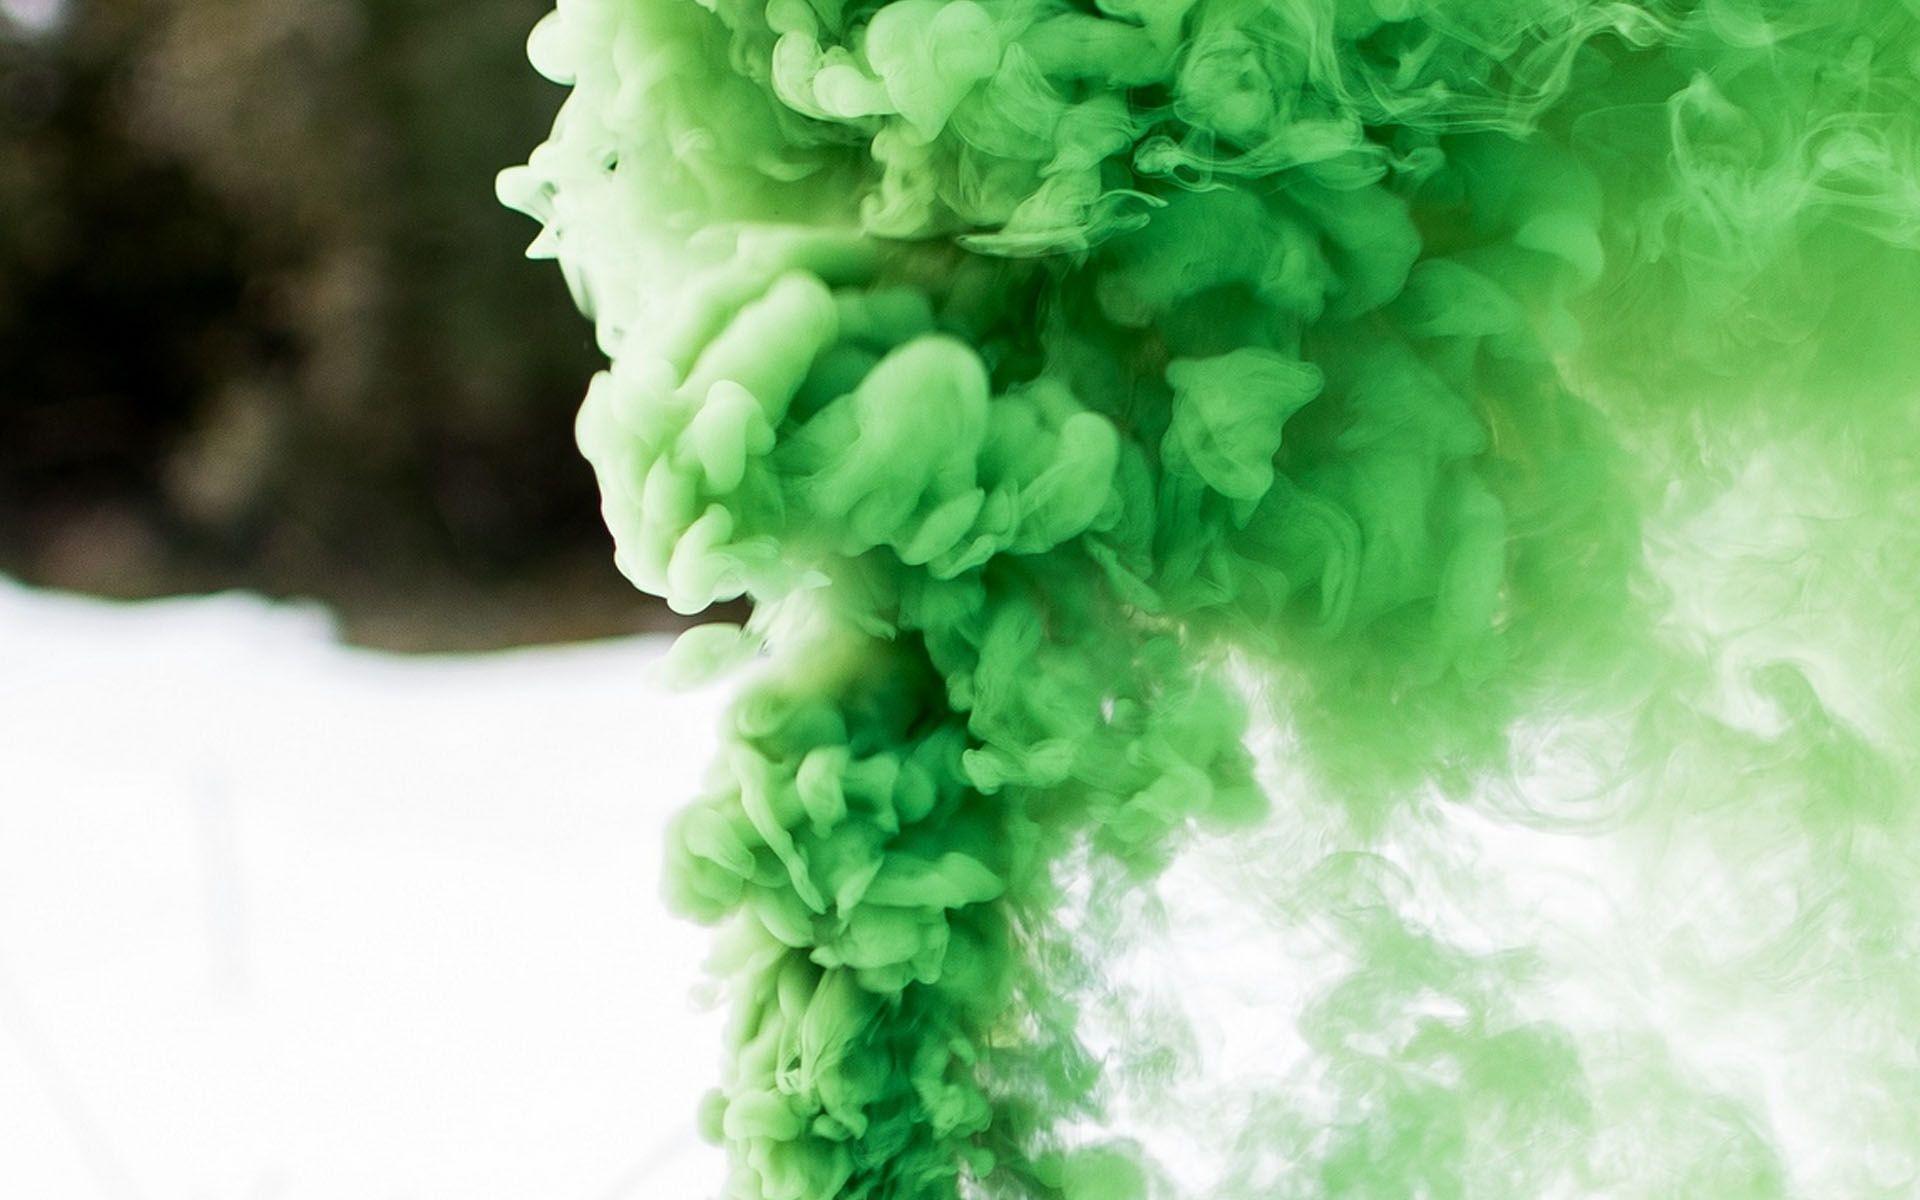 Green Smoke Wallpaper 62 Pictures